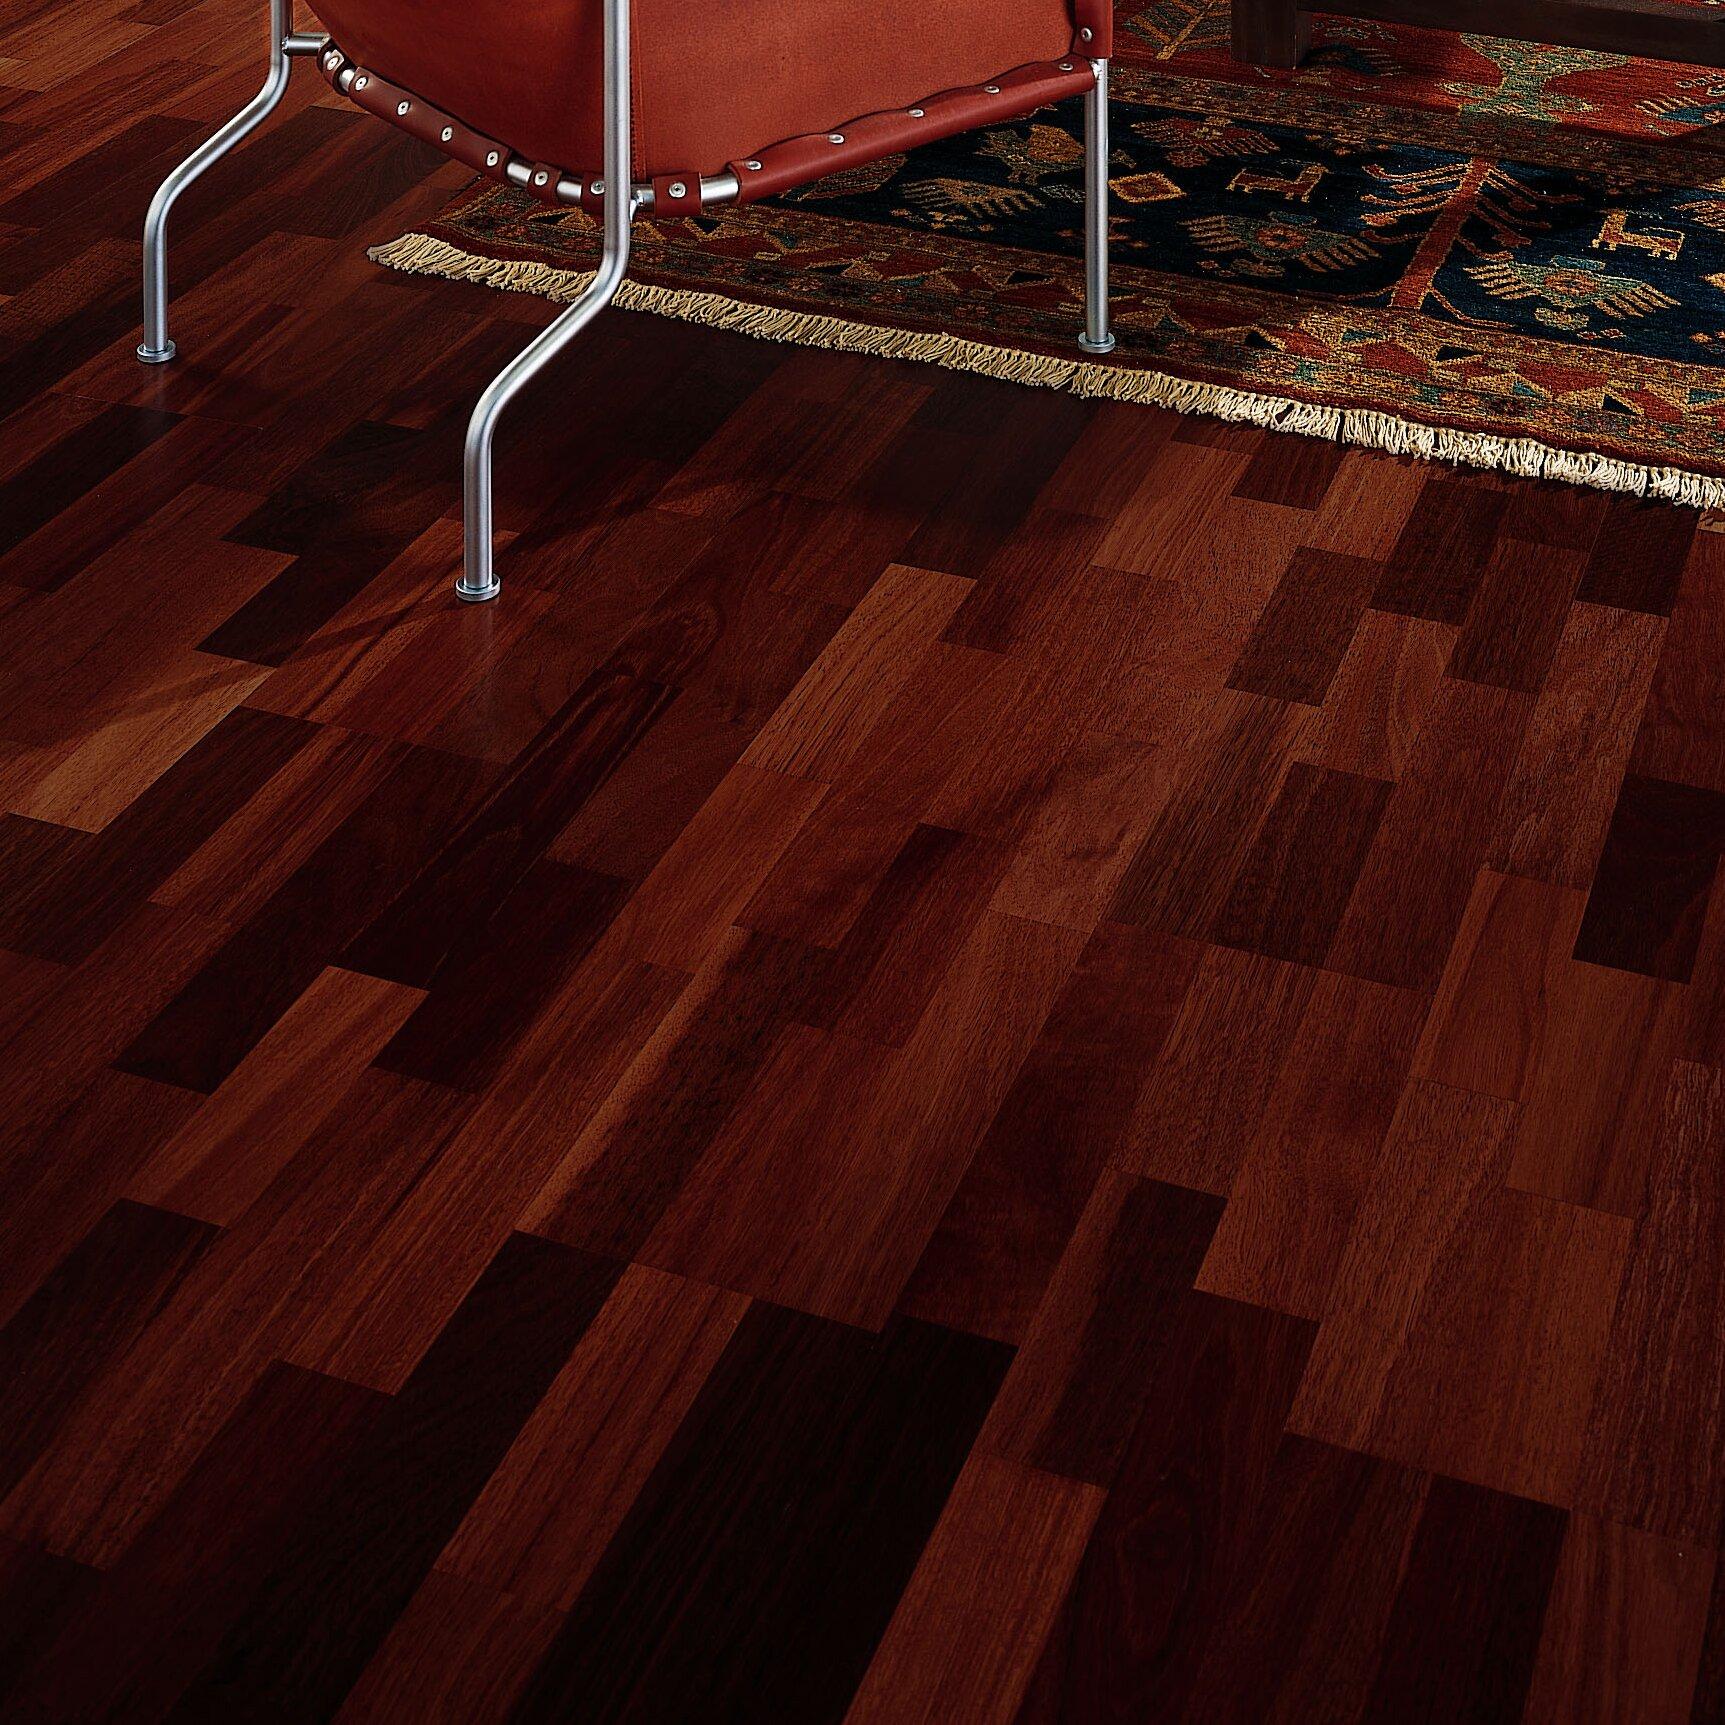 Kahrs world naturals 7 7 8 engineered jarrah sydney for Wood floor 7 days to die